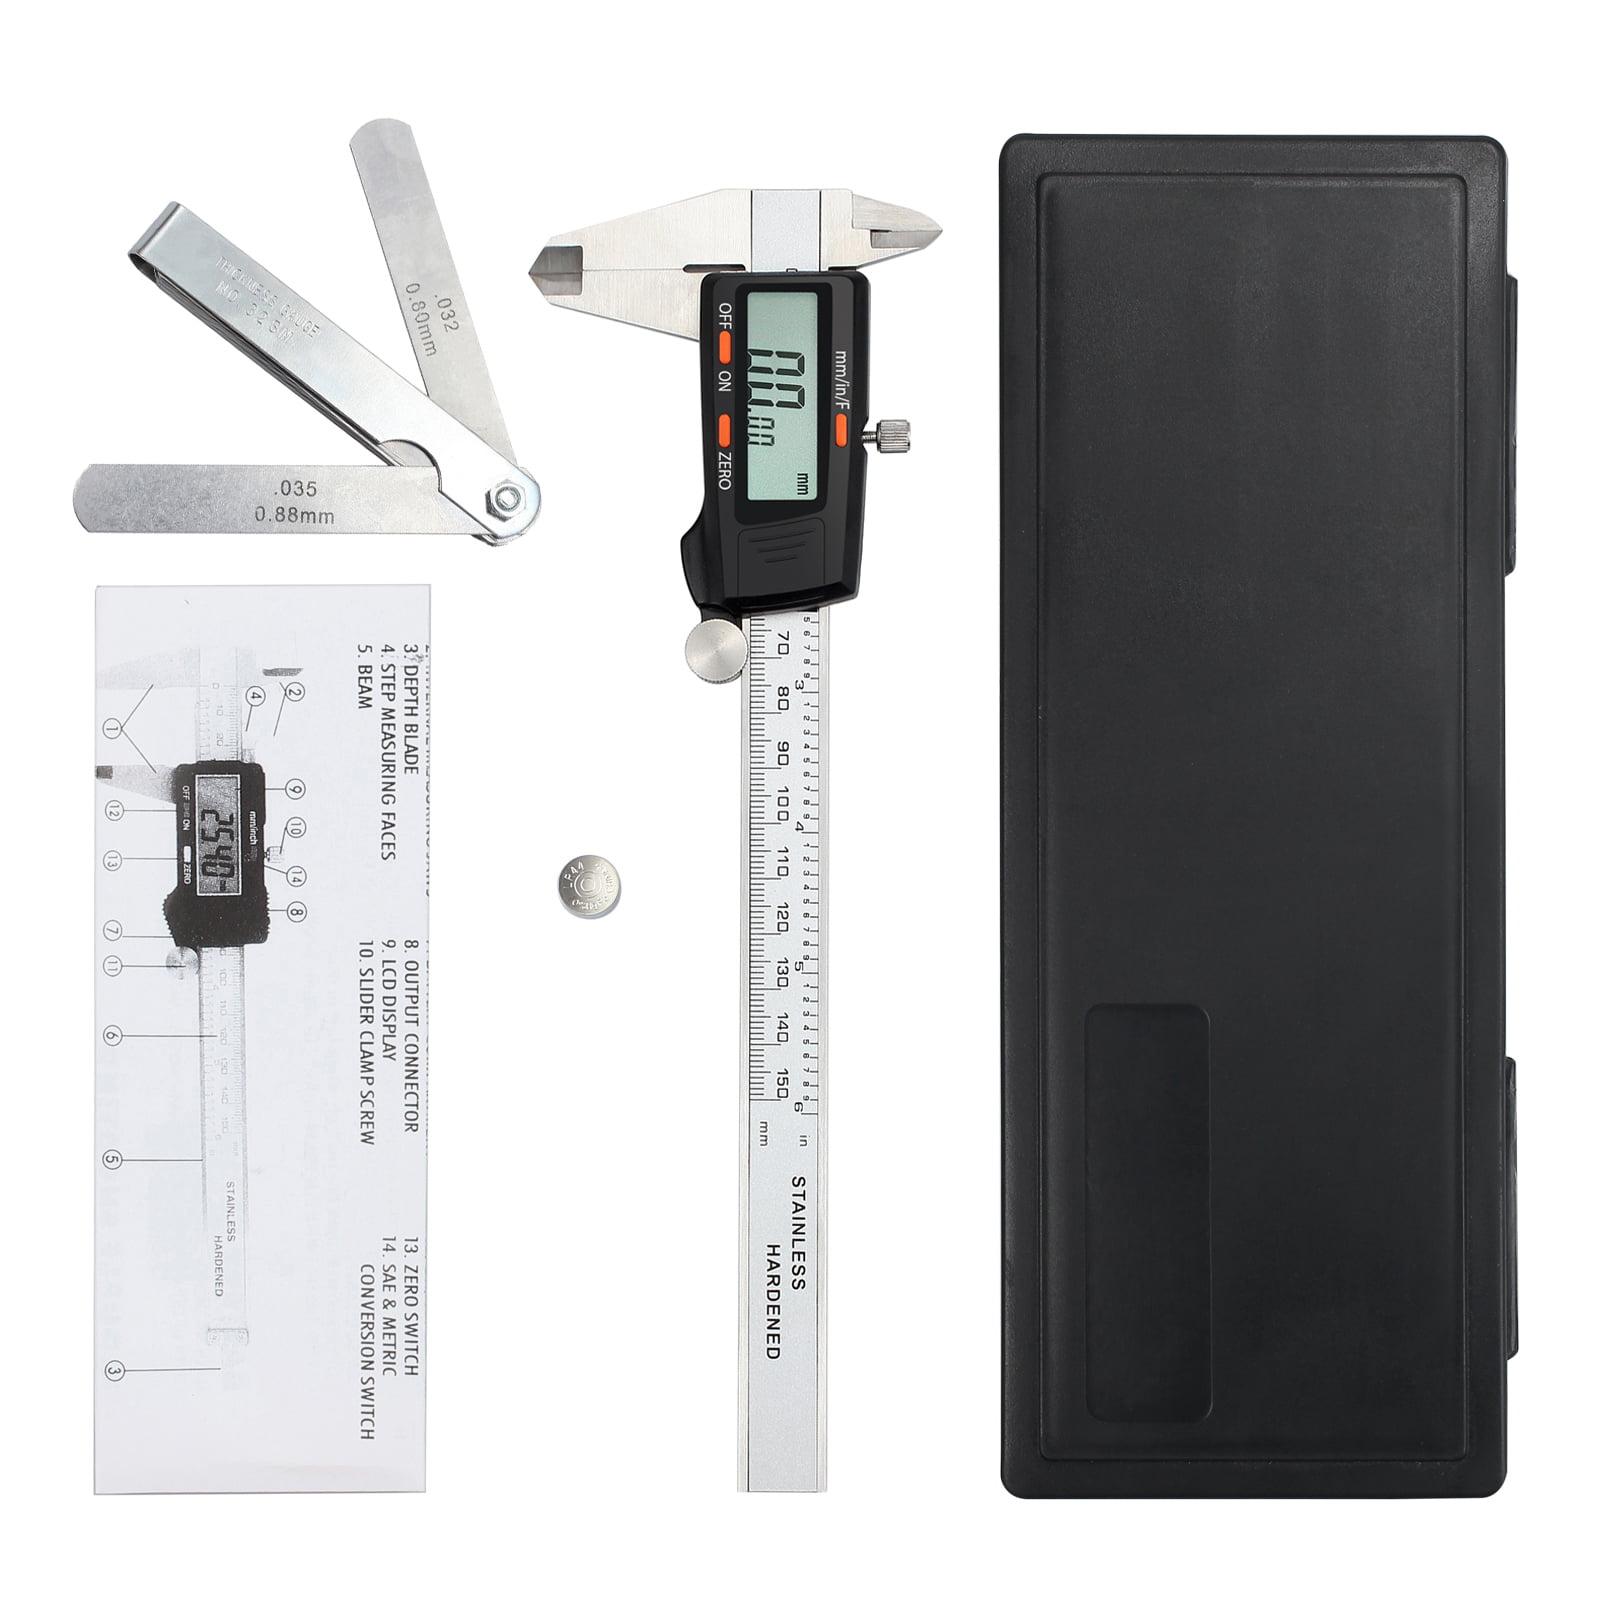 eSynic Digital Vernier Caliper with Feeler Gauge 150mm and 6